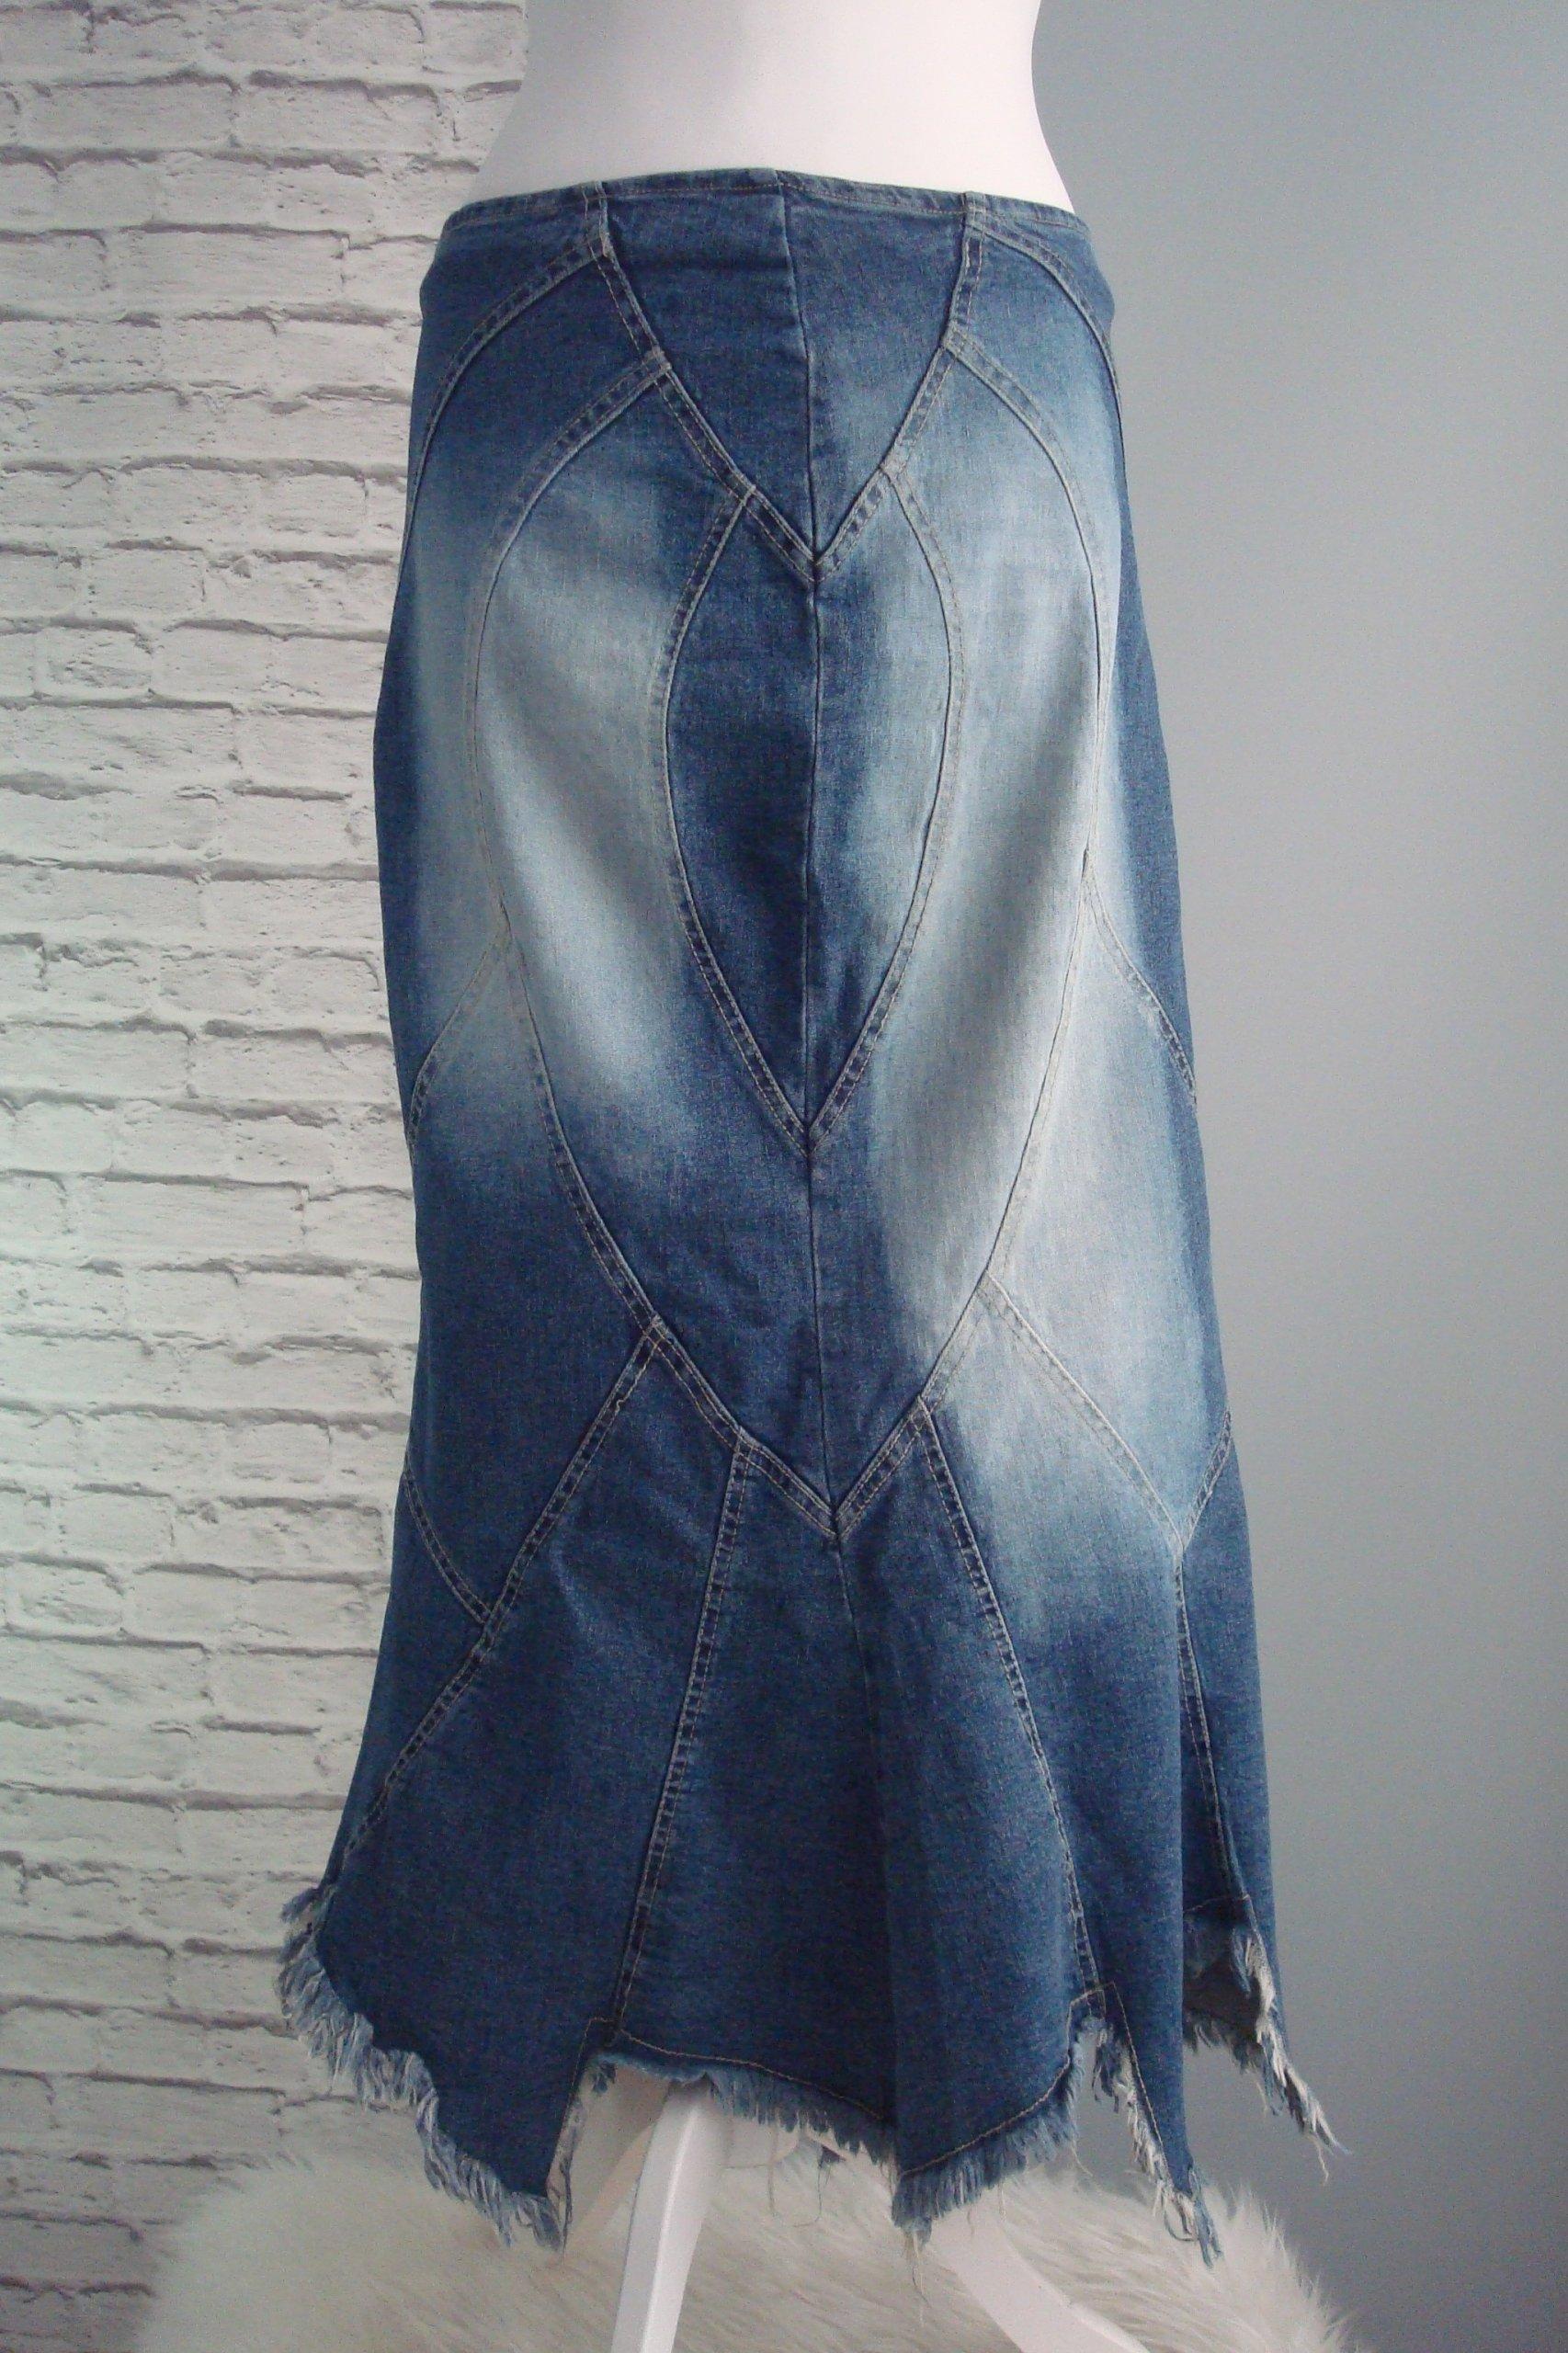 4b8936ebc9 Niebieska długa spódnica jeans asymetryczna 40 42 - 7645680205 ...